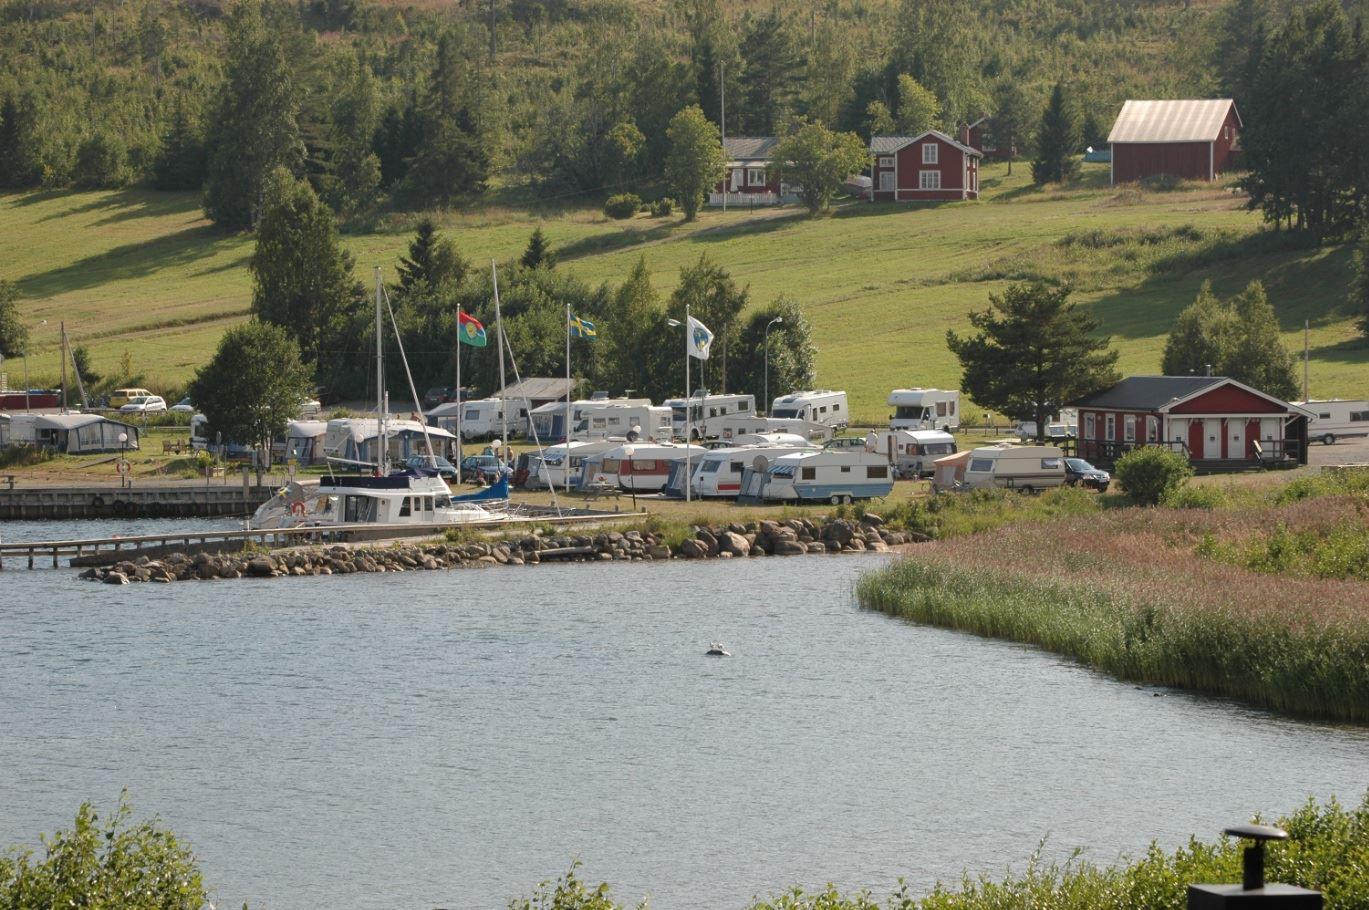 Foto: Urban Lidbaum,  © Kramfors kommun, Barsta gästhamn